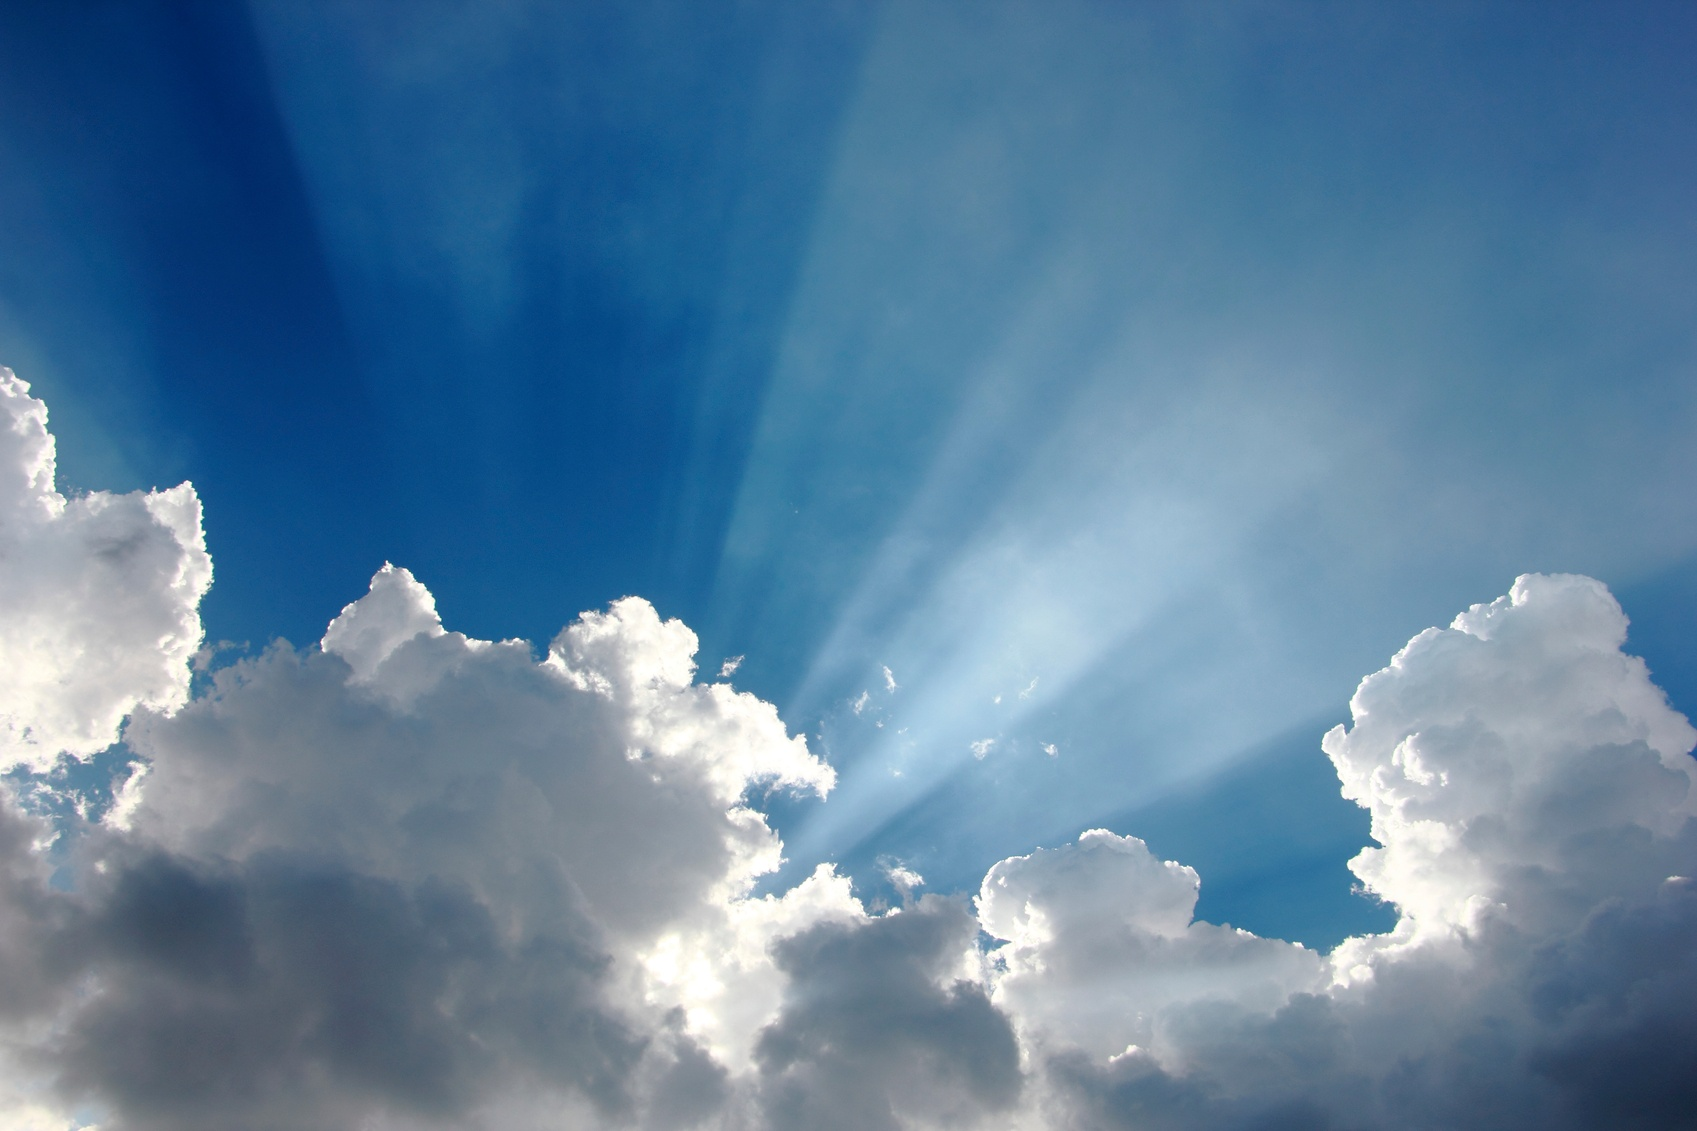 Blue-sky-with-clouds-and-sun-000080464611_Medium.jpg